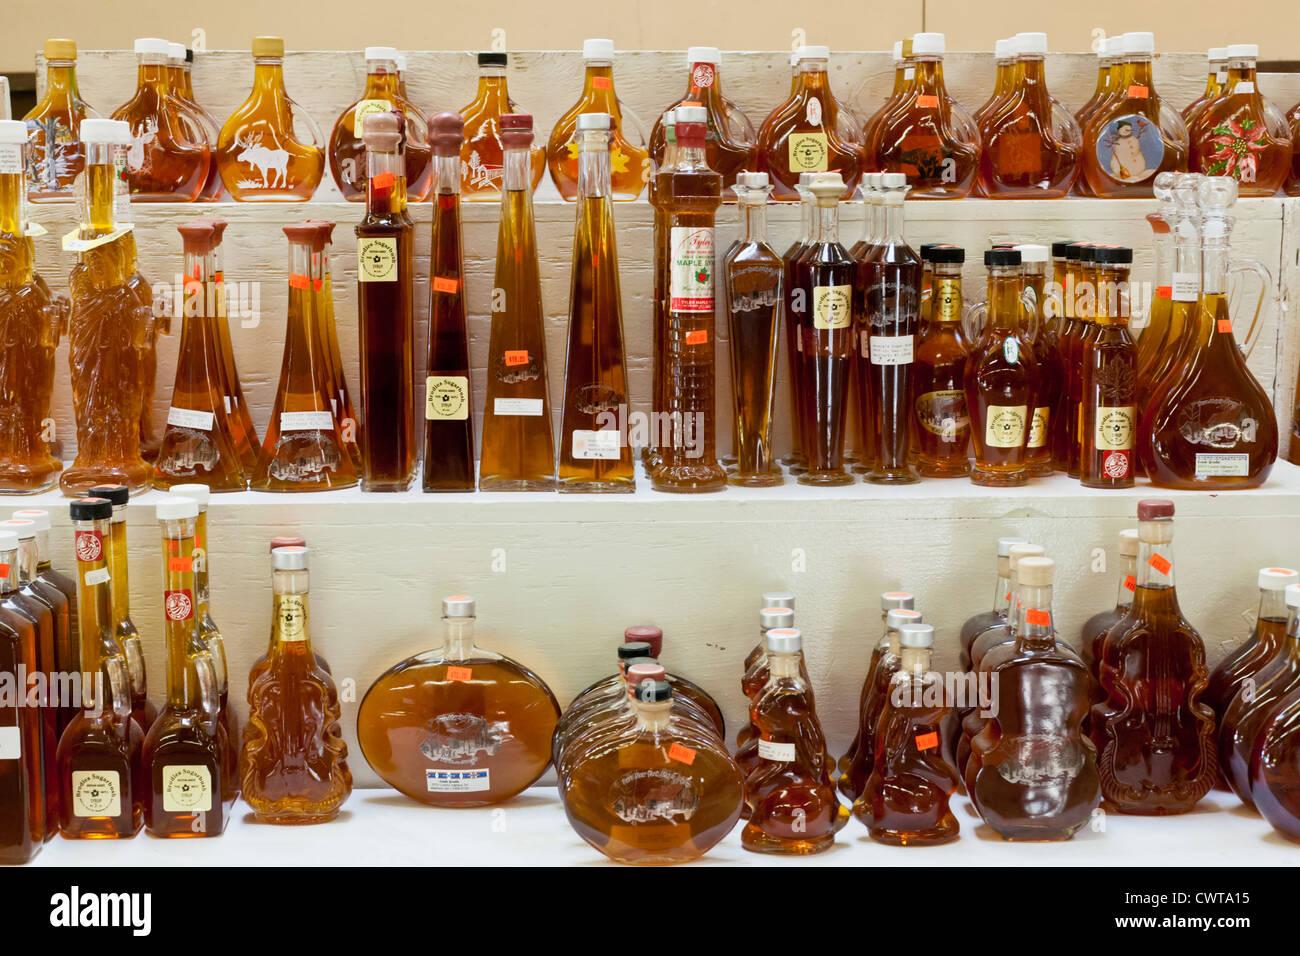 New york montgomery county fonda - Maple Syrup Display In Various Bottles Fonda Fair Montgomery County New York State